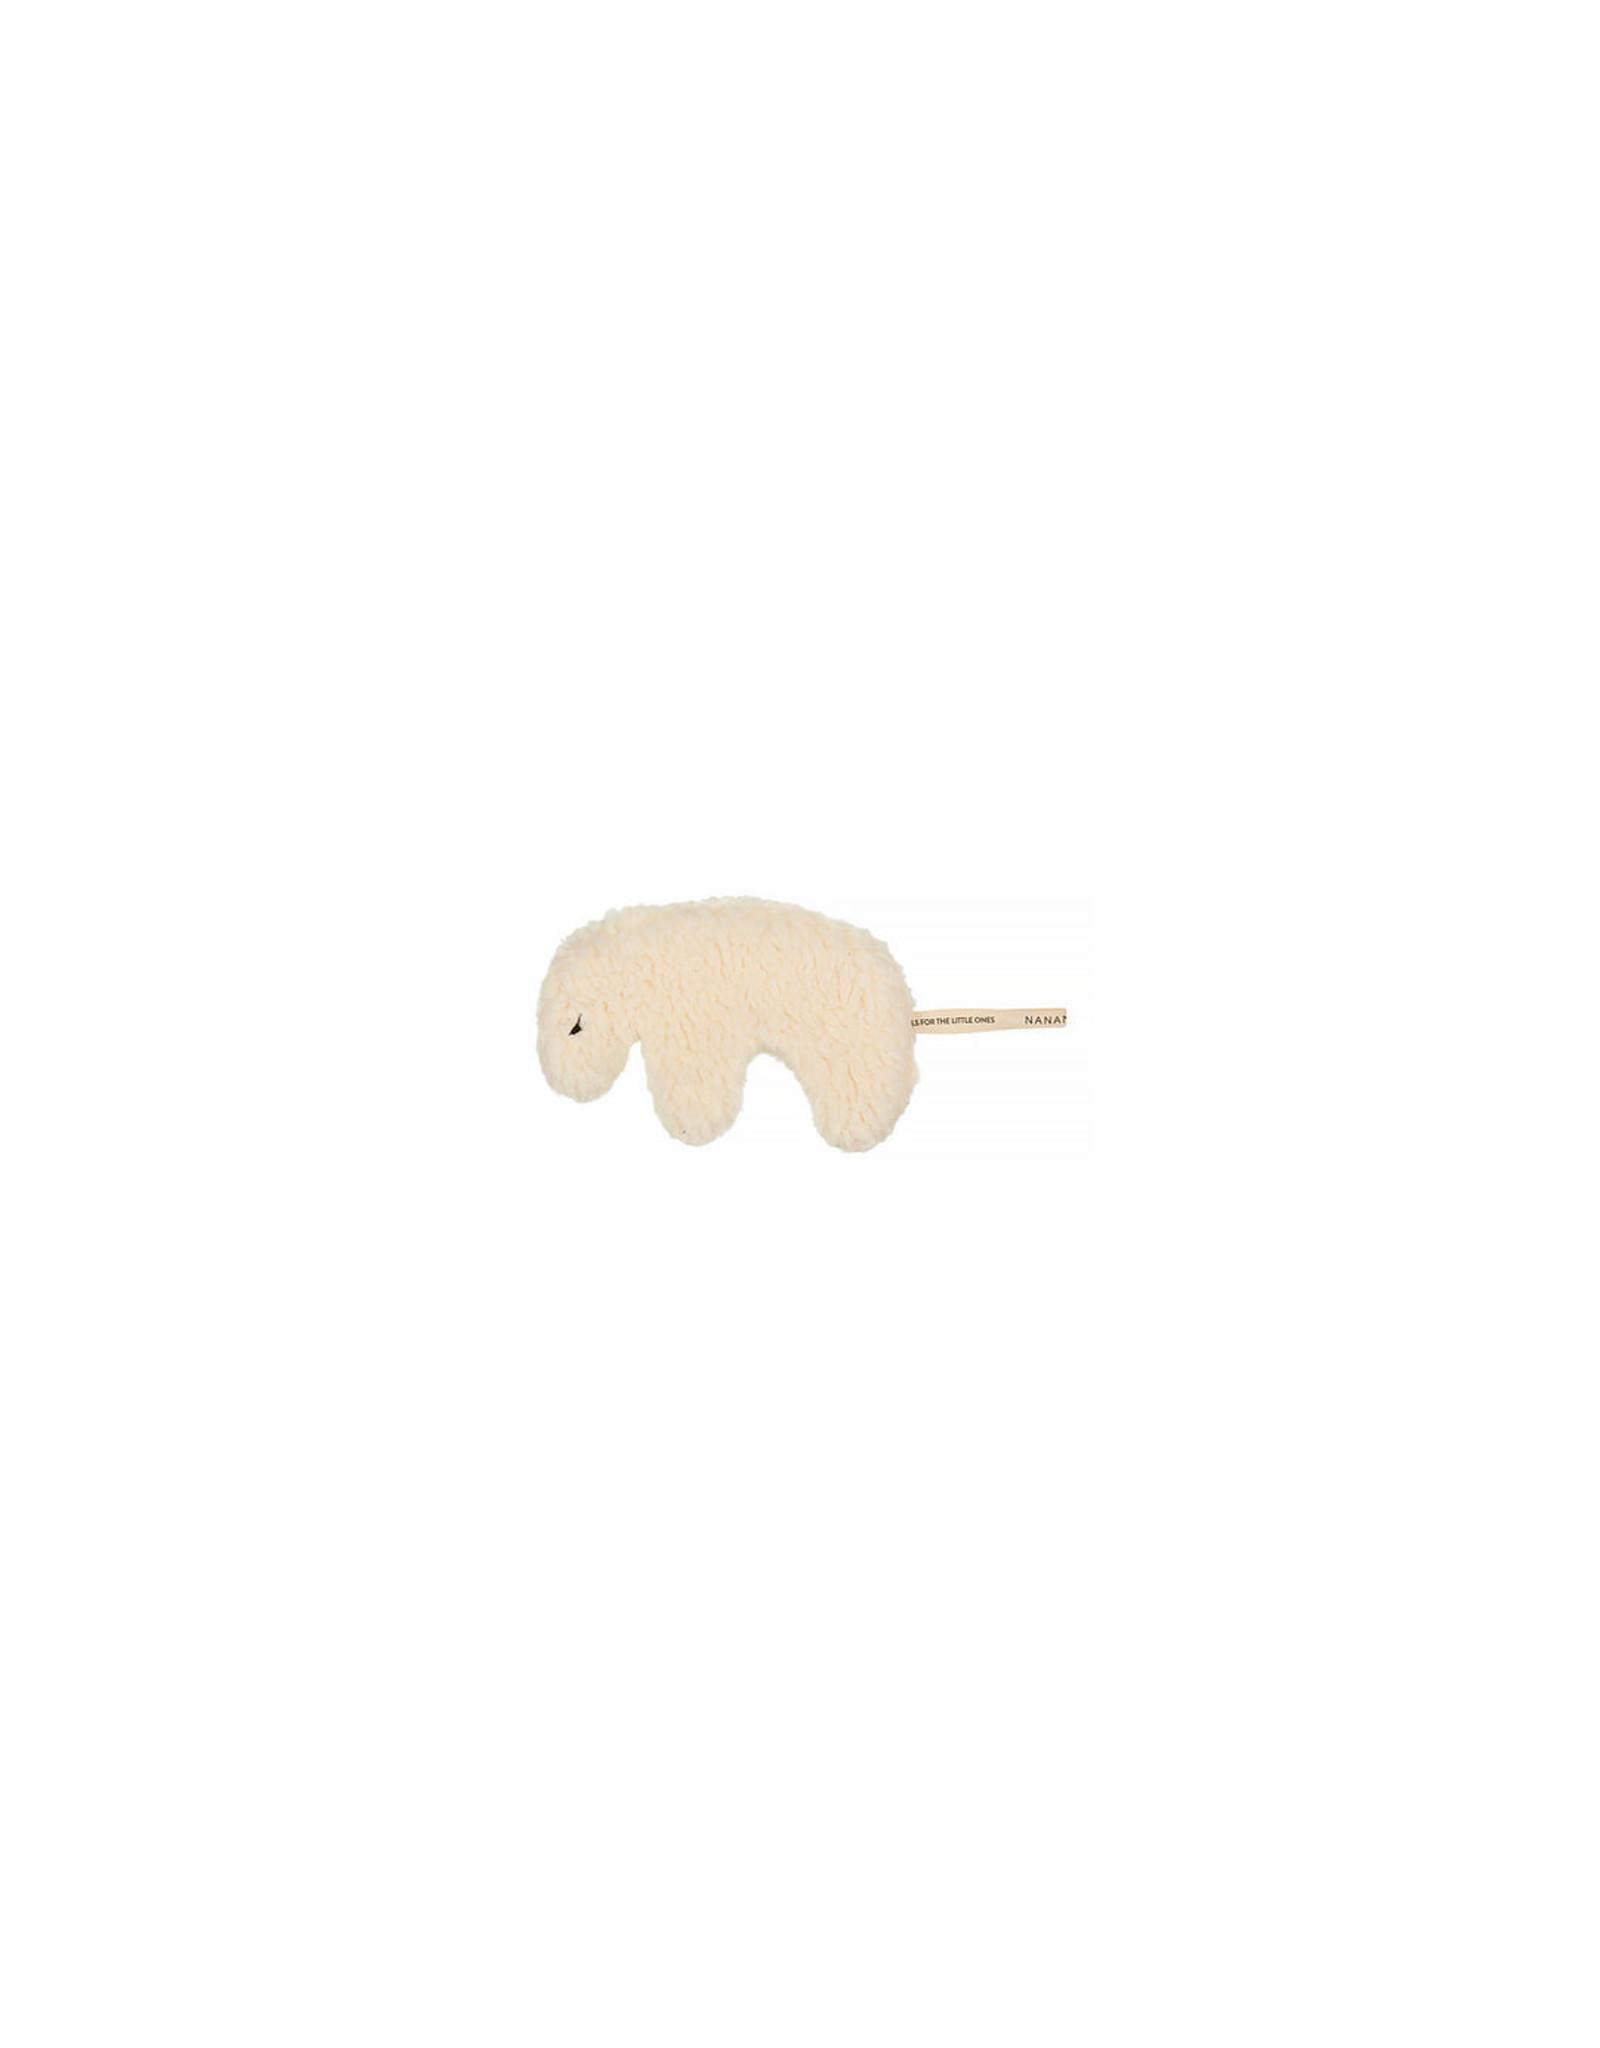 Nanami Nanami - Tuttle Polarbear Teddy